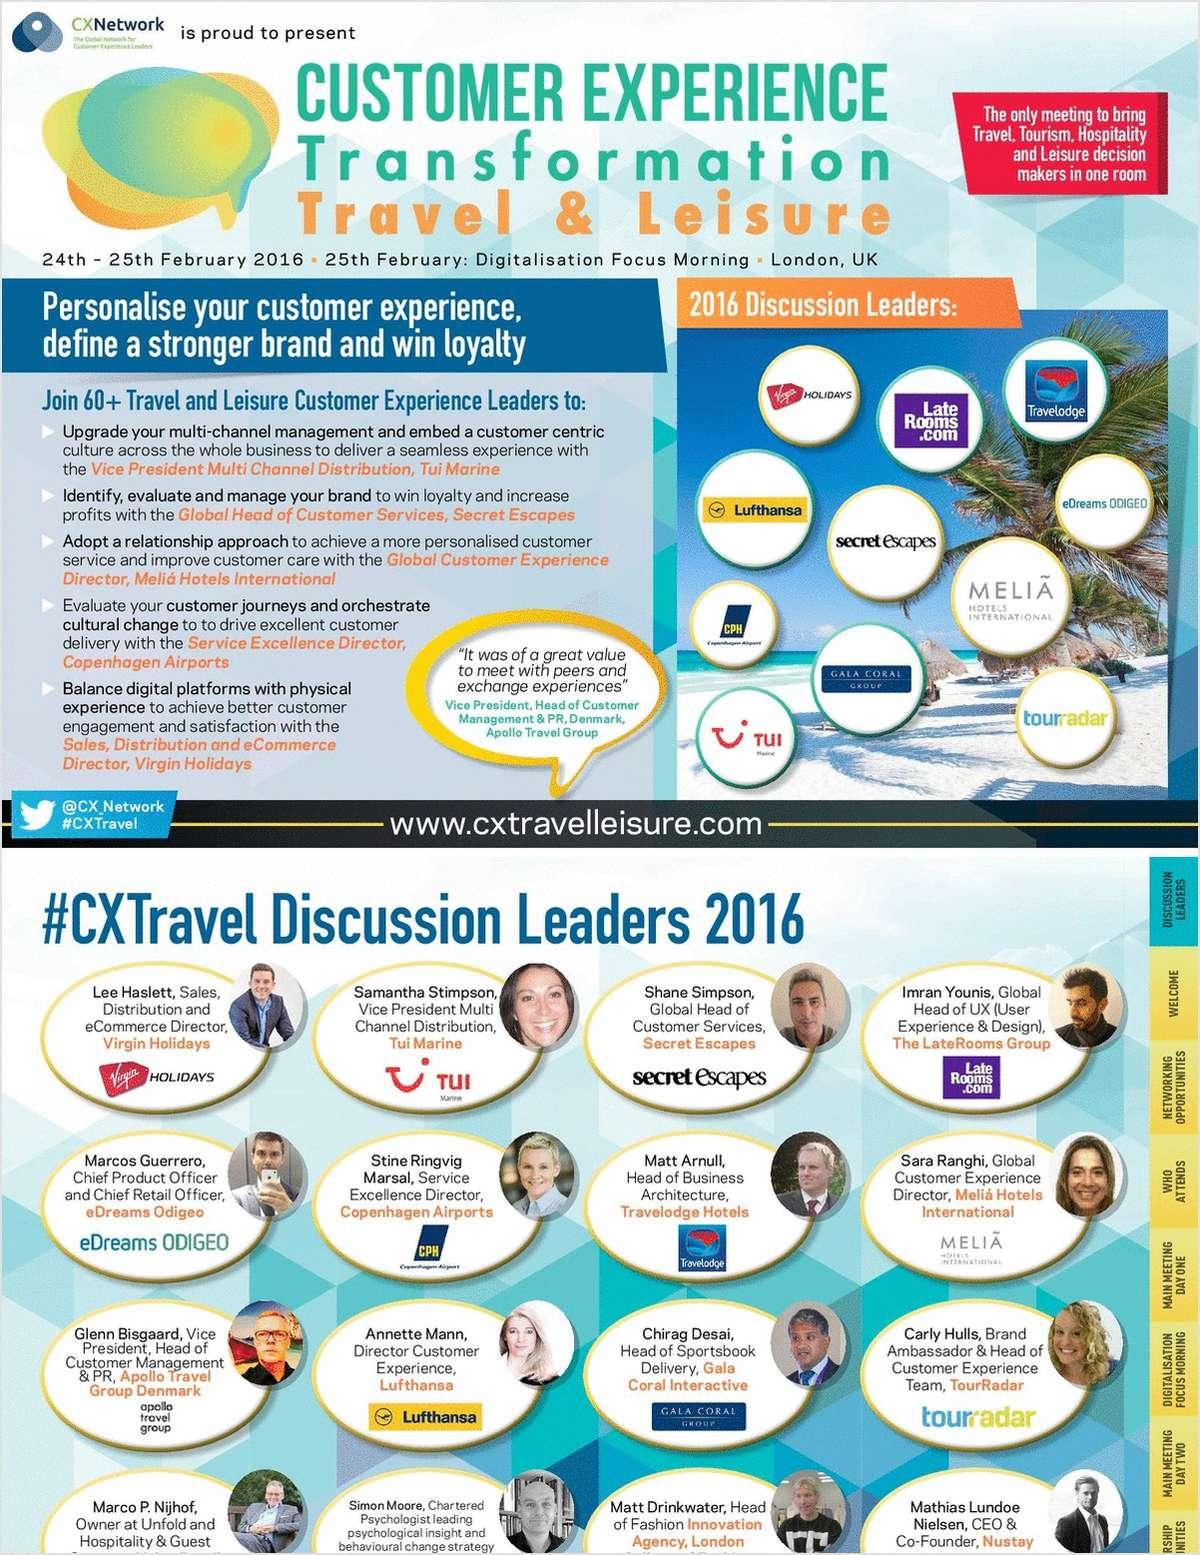 Customer Experience Transformation: Travel & Leisure